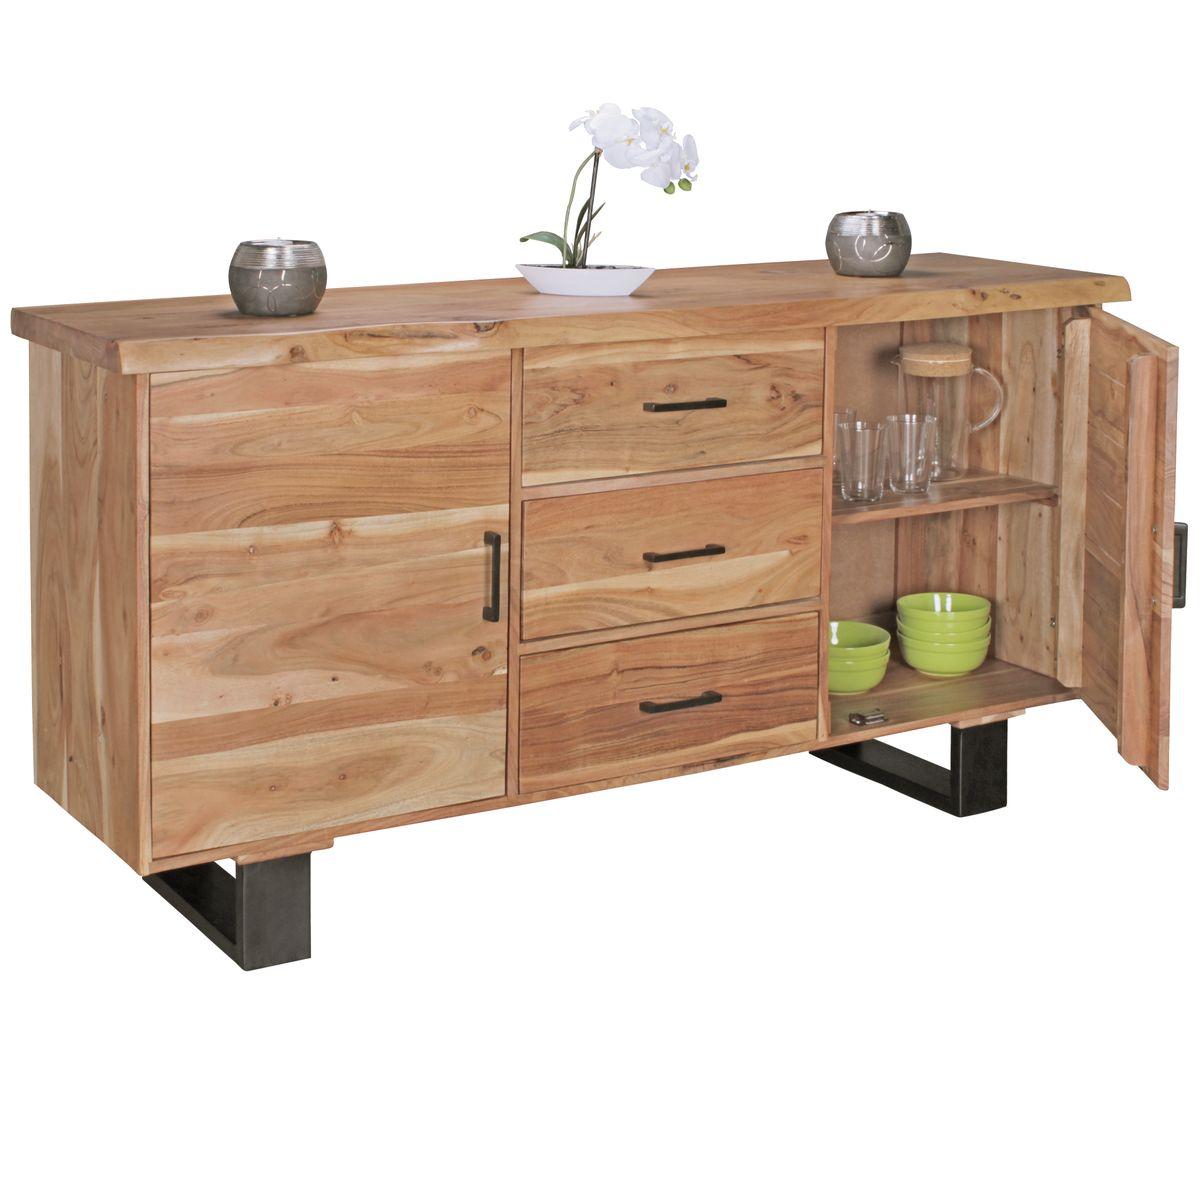 sideboard akazie 160 cm massivholz kommode schrank anrichte landhaus baumkante ebay. Black Bedroom Furniture Sets. Home Design Ideas